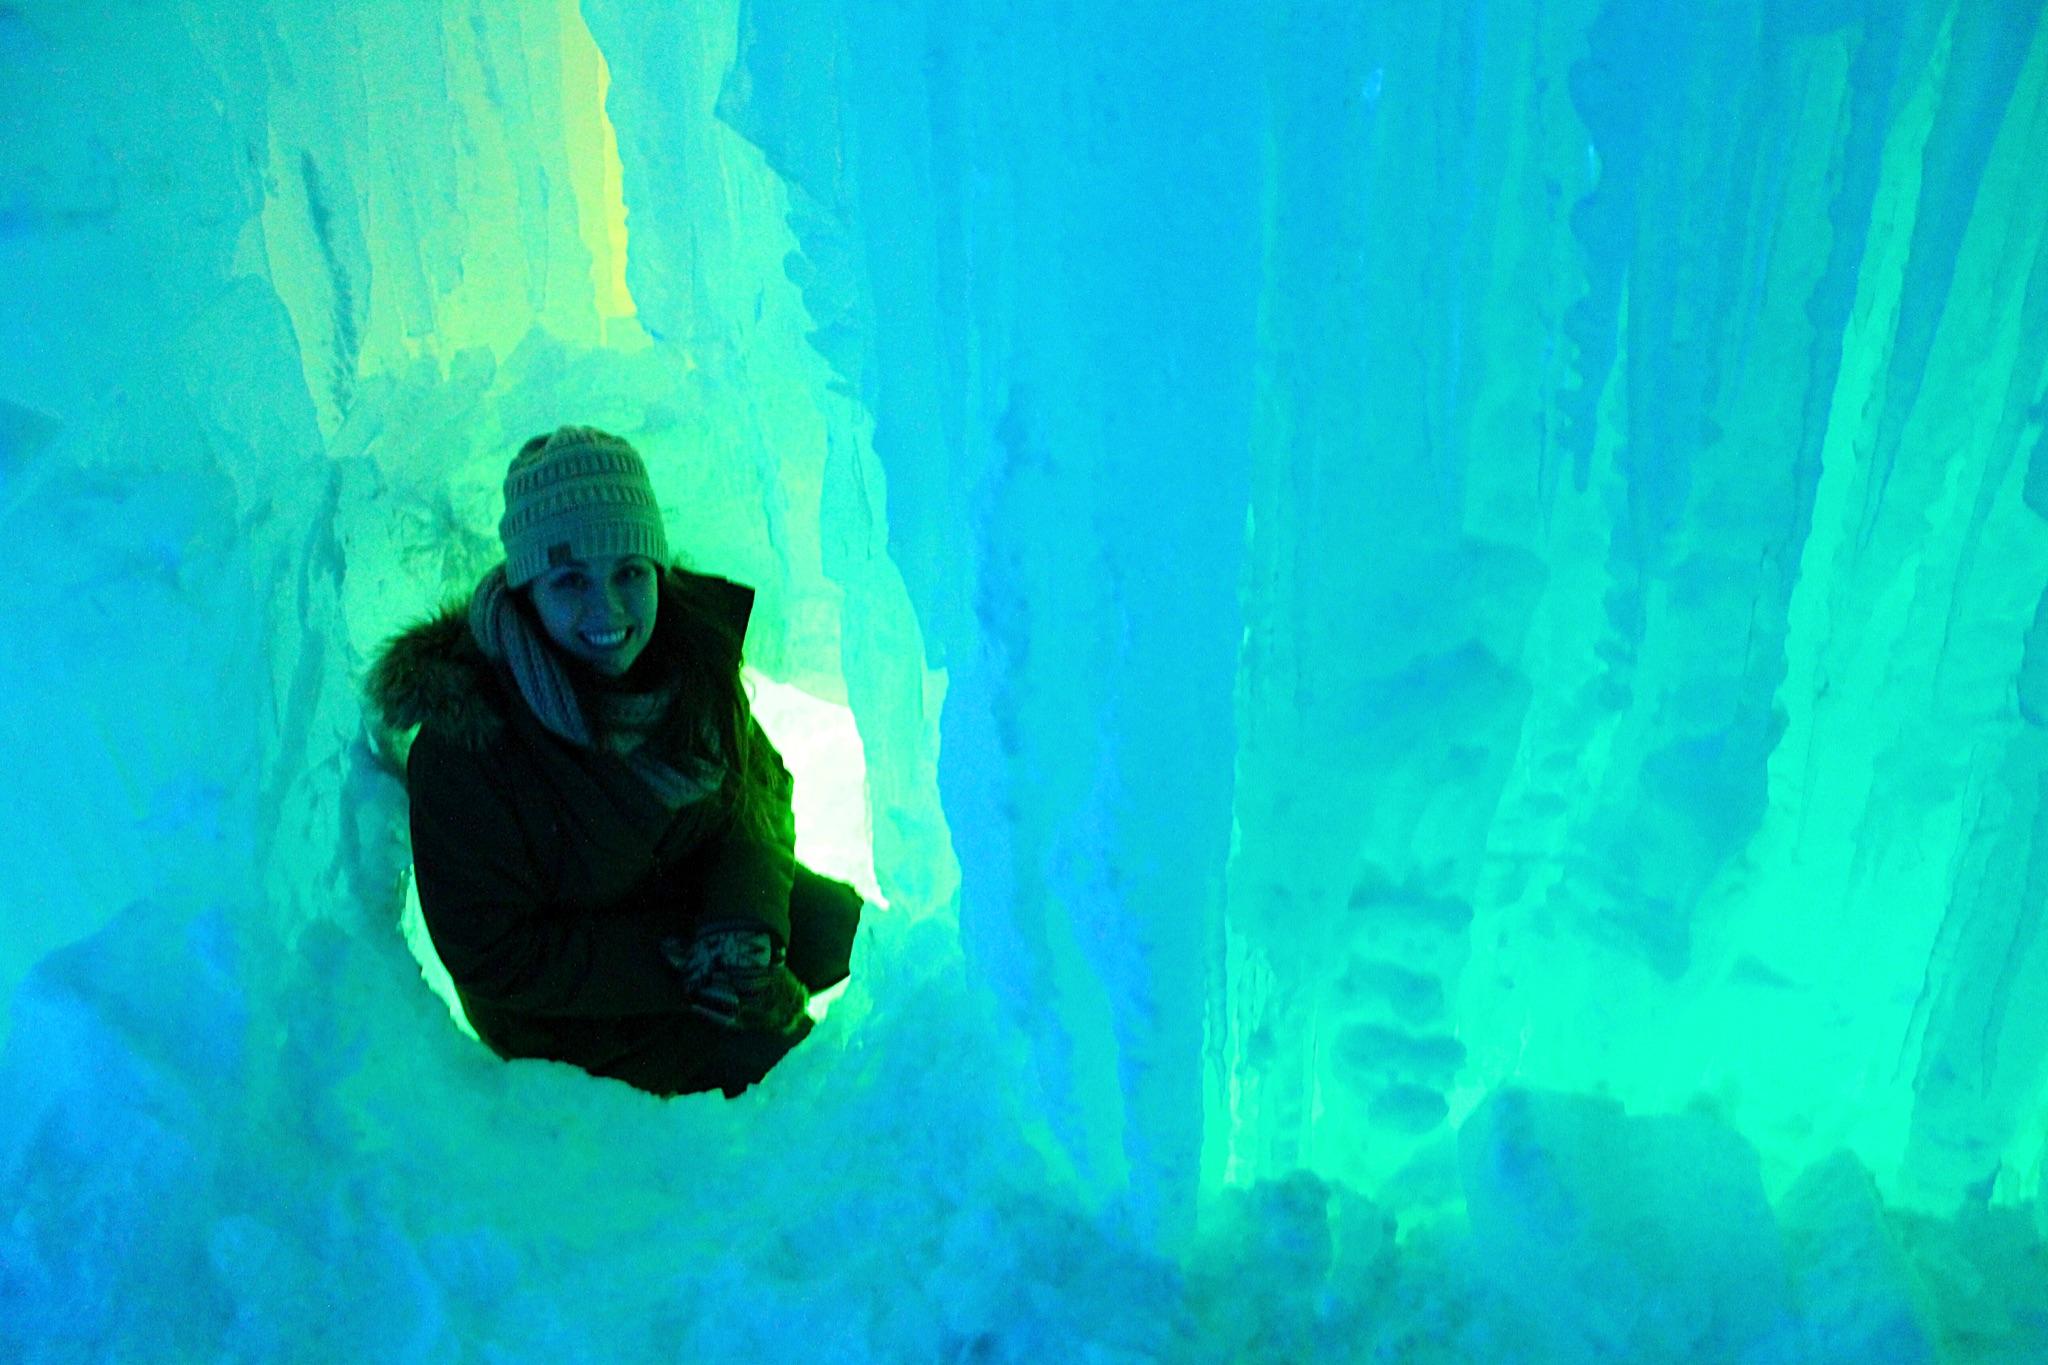 ice-castle-dillon.jpg